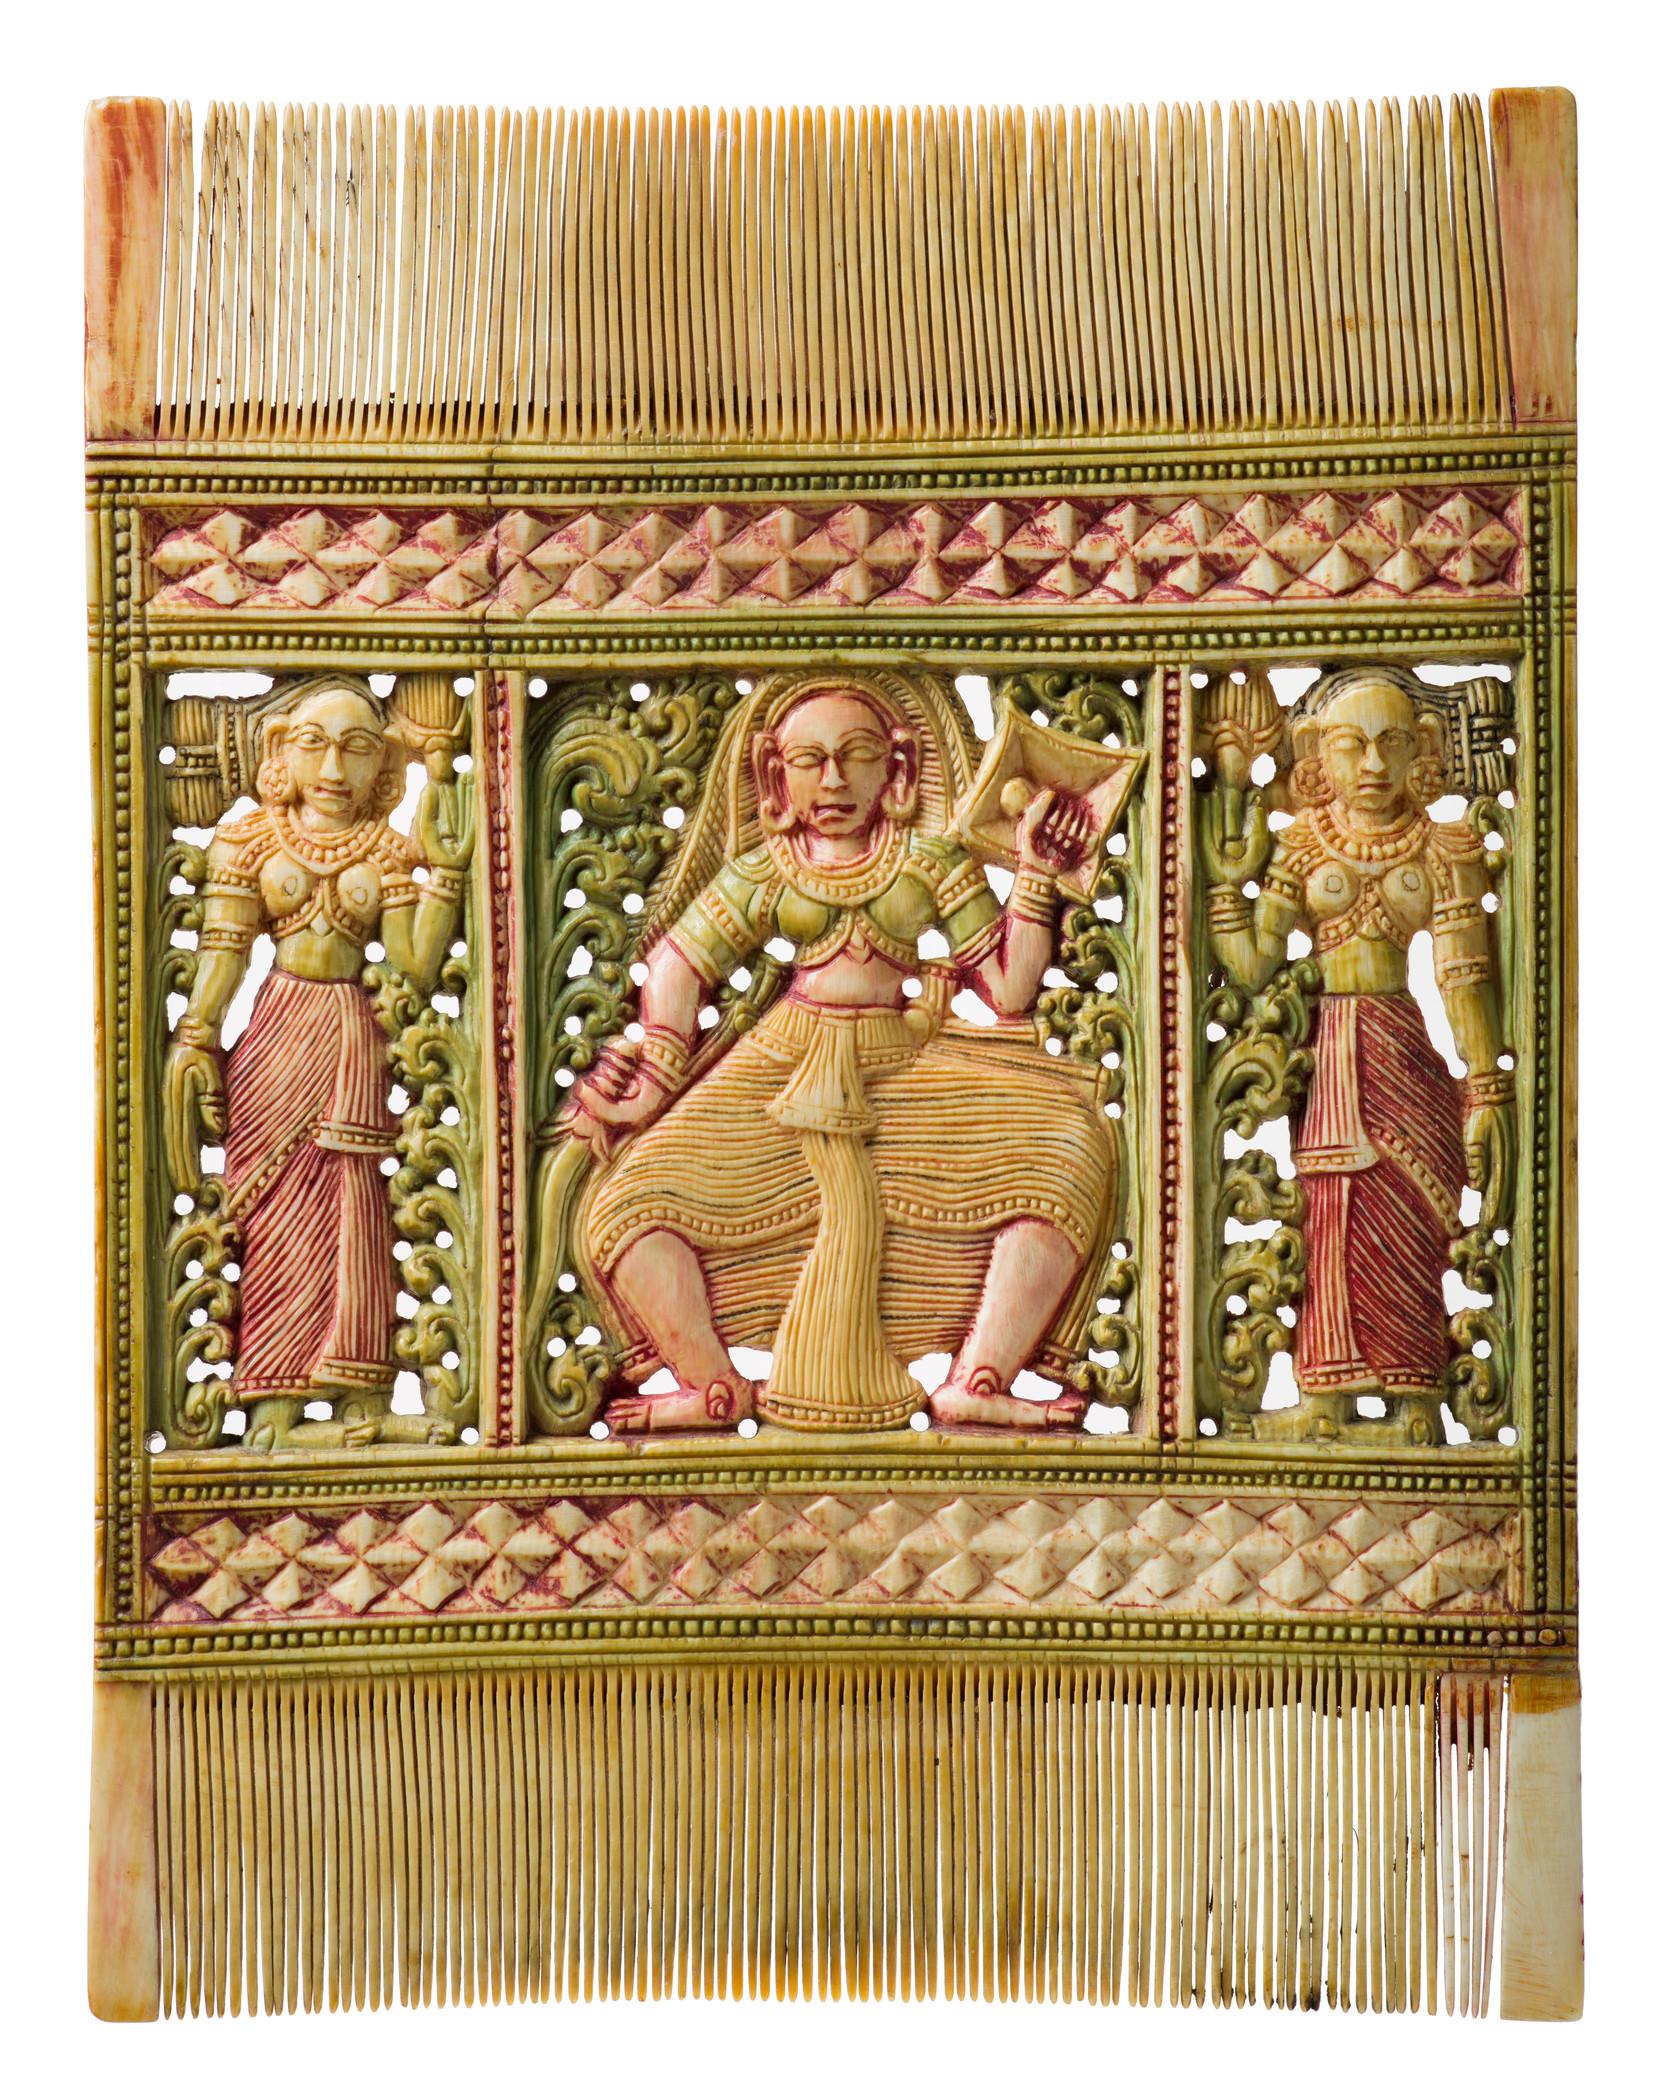 Comb (18th-19th century), artist unknown. Image courtesy of LACMA.